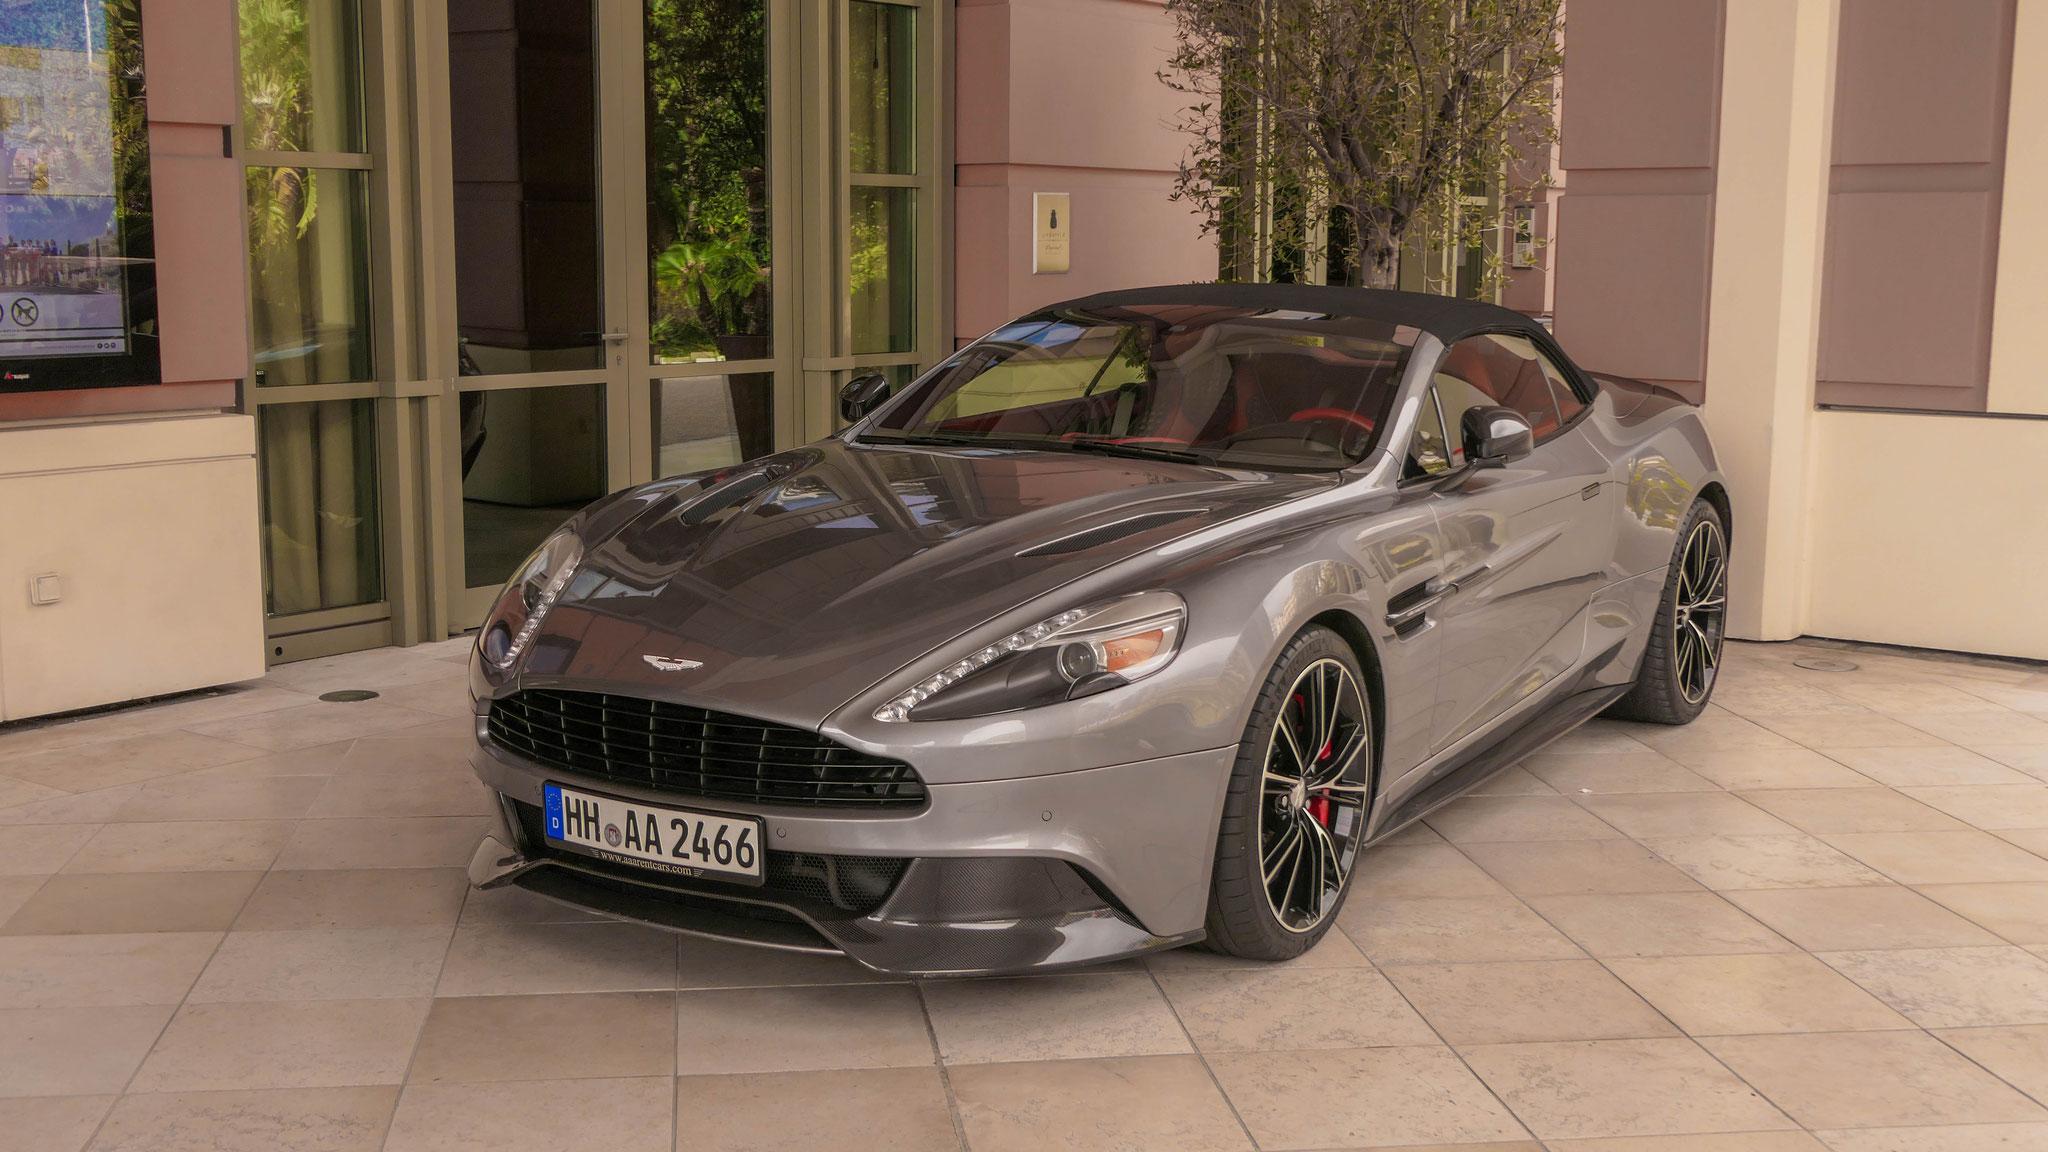 Aston Martin Vanquish Volante - HH-AA-2466